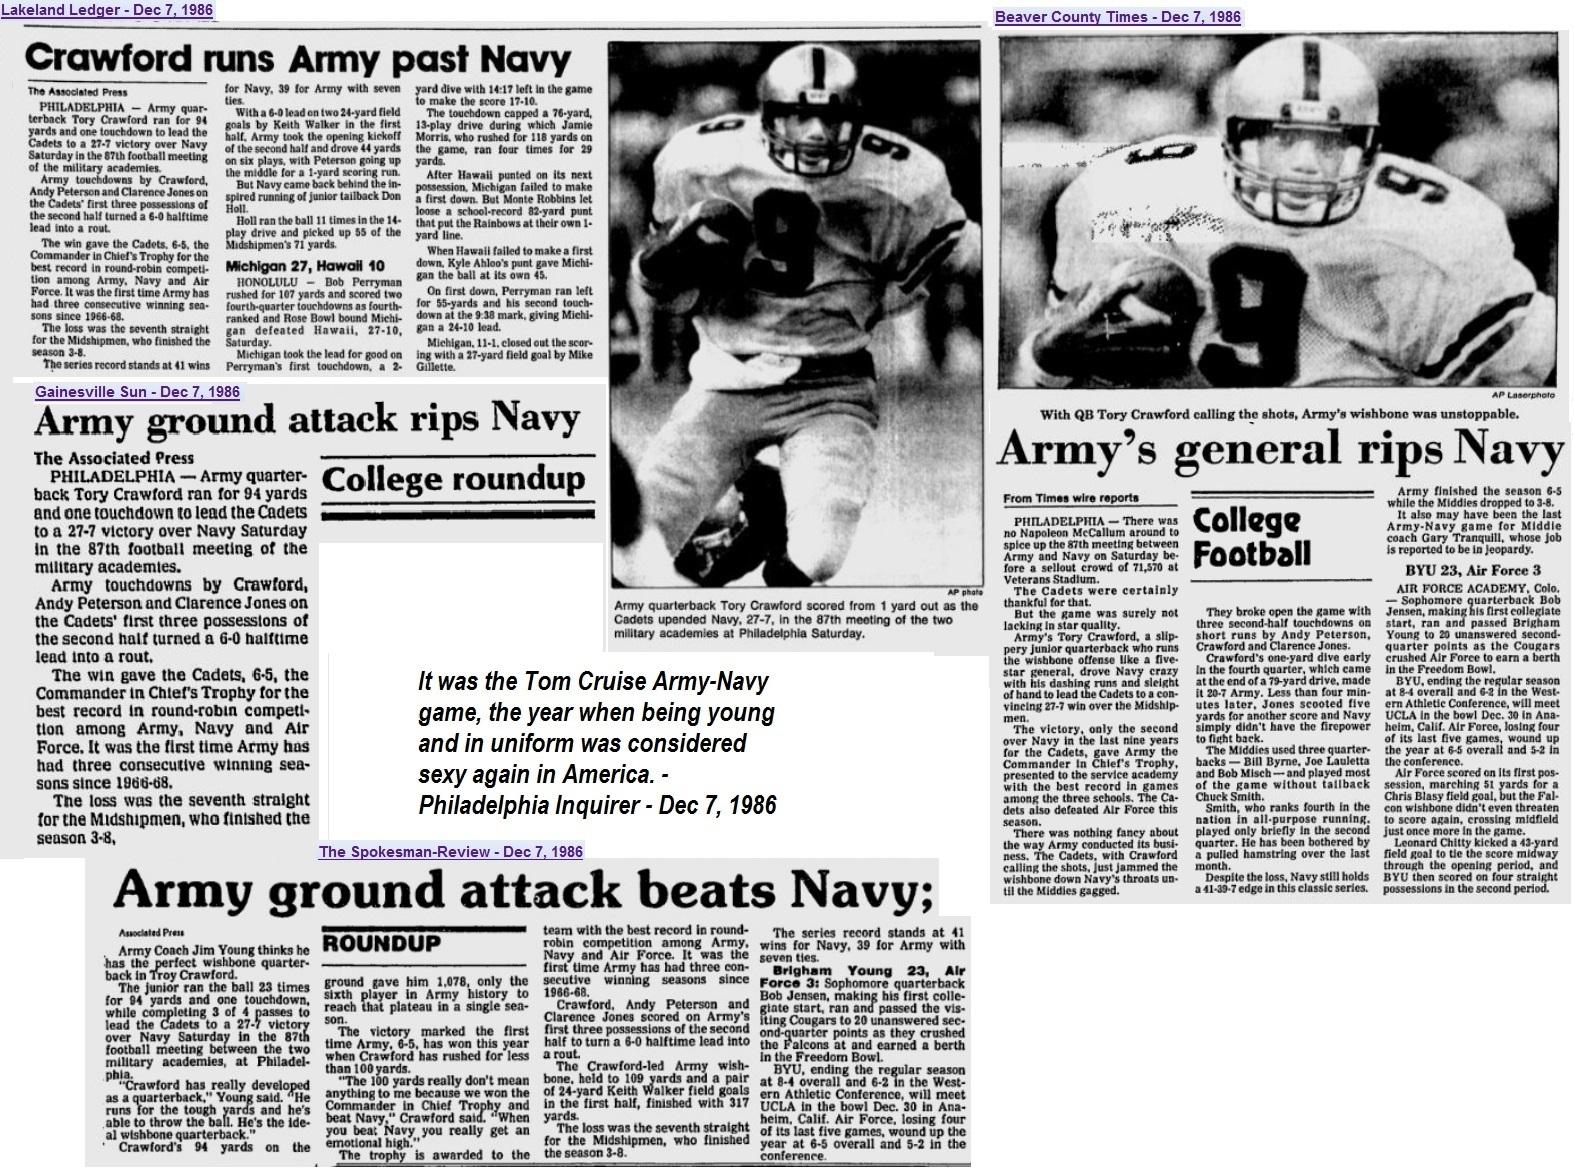 ArmyFB_1986_vsNavy_various_Dec71986